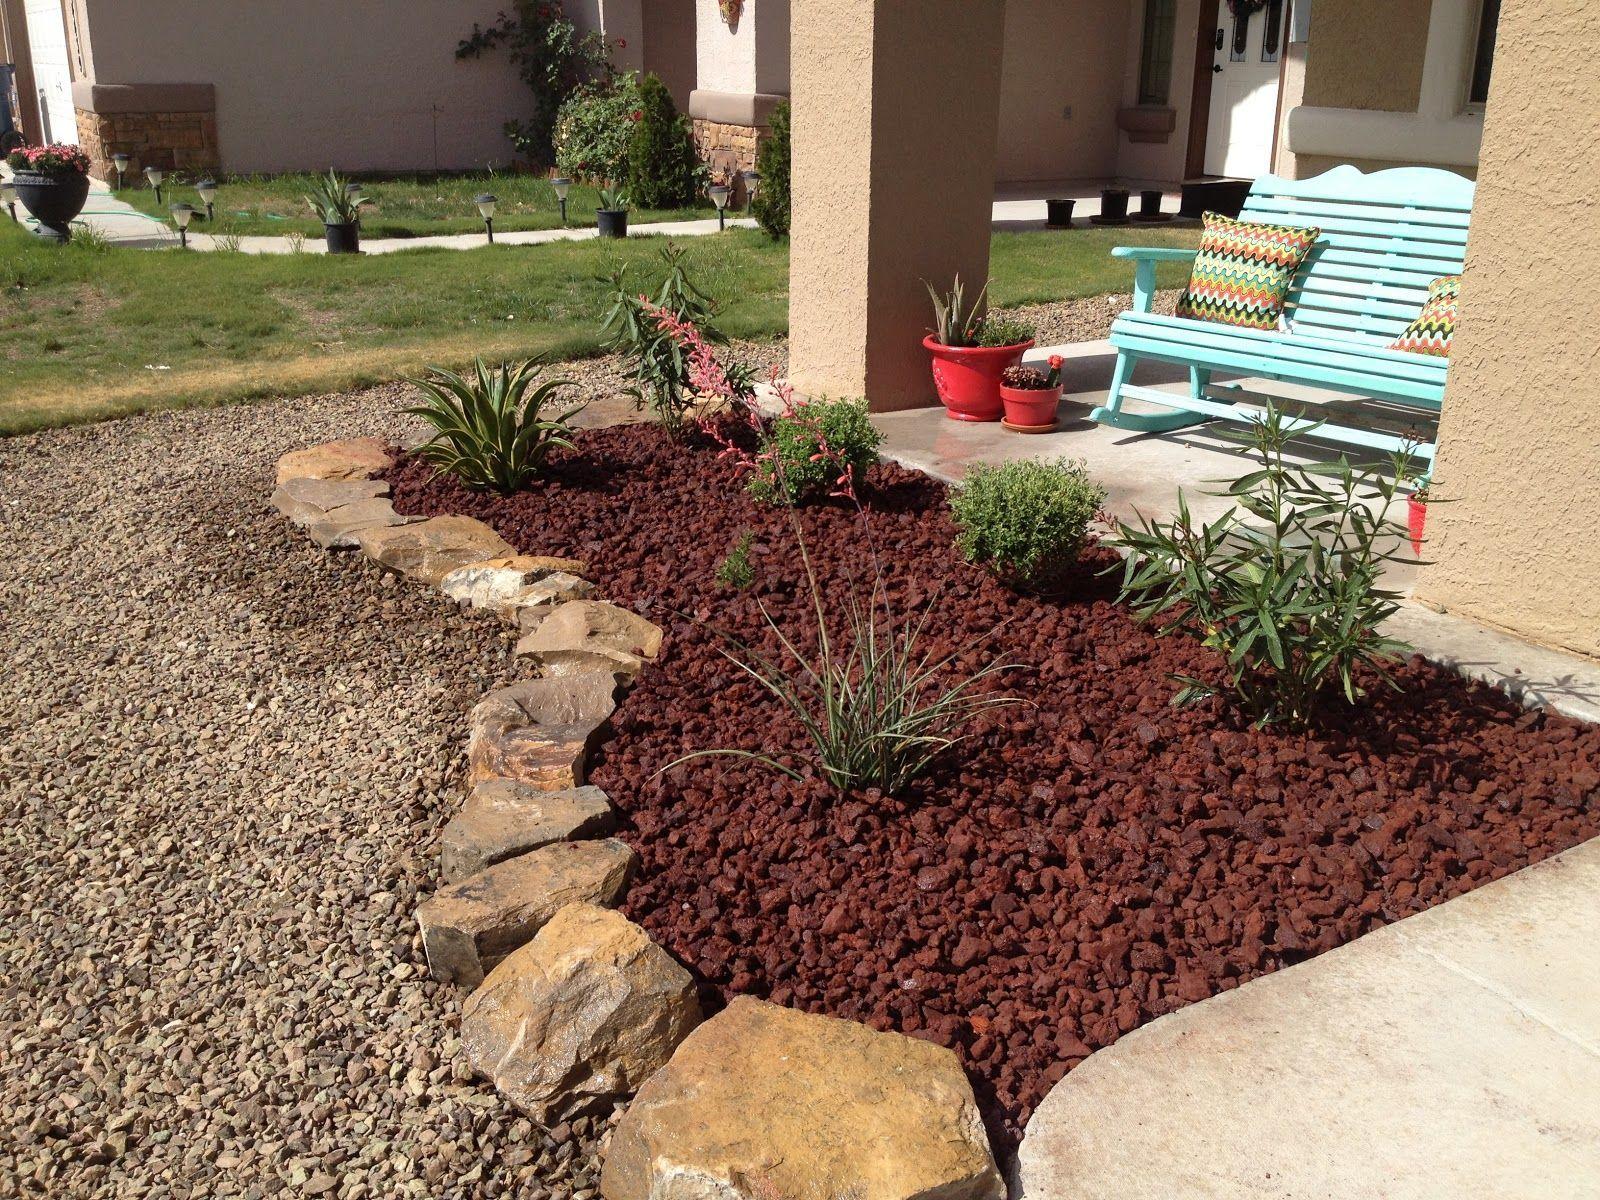 Garden Landscaping Ideas Pictures Of Landscape Inspiration Excerpt ...